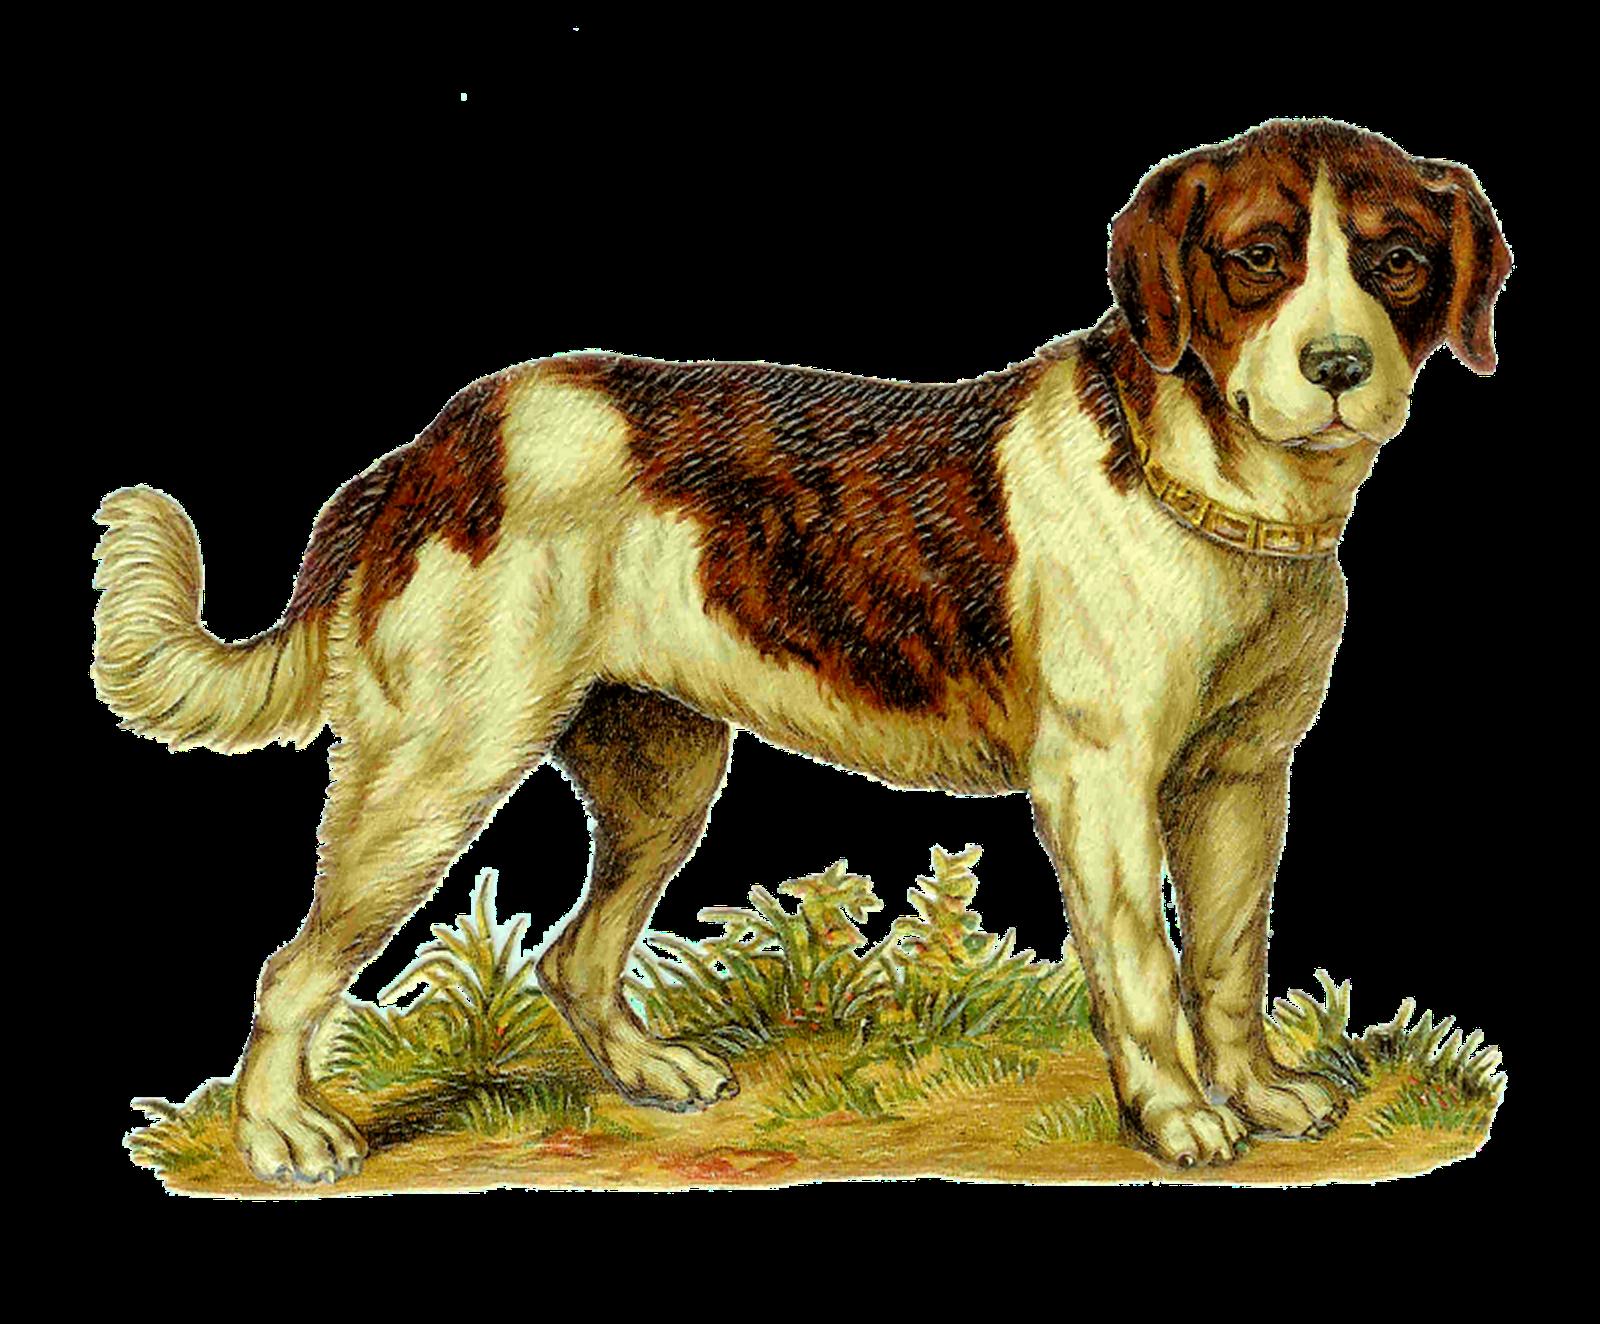 Antique images vintage dog. Pet clipart first